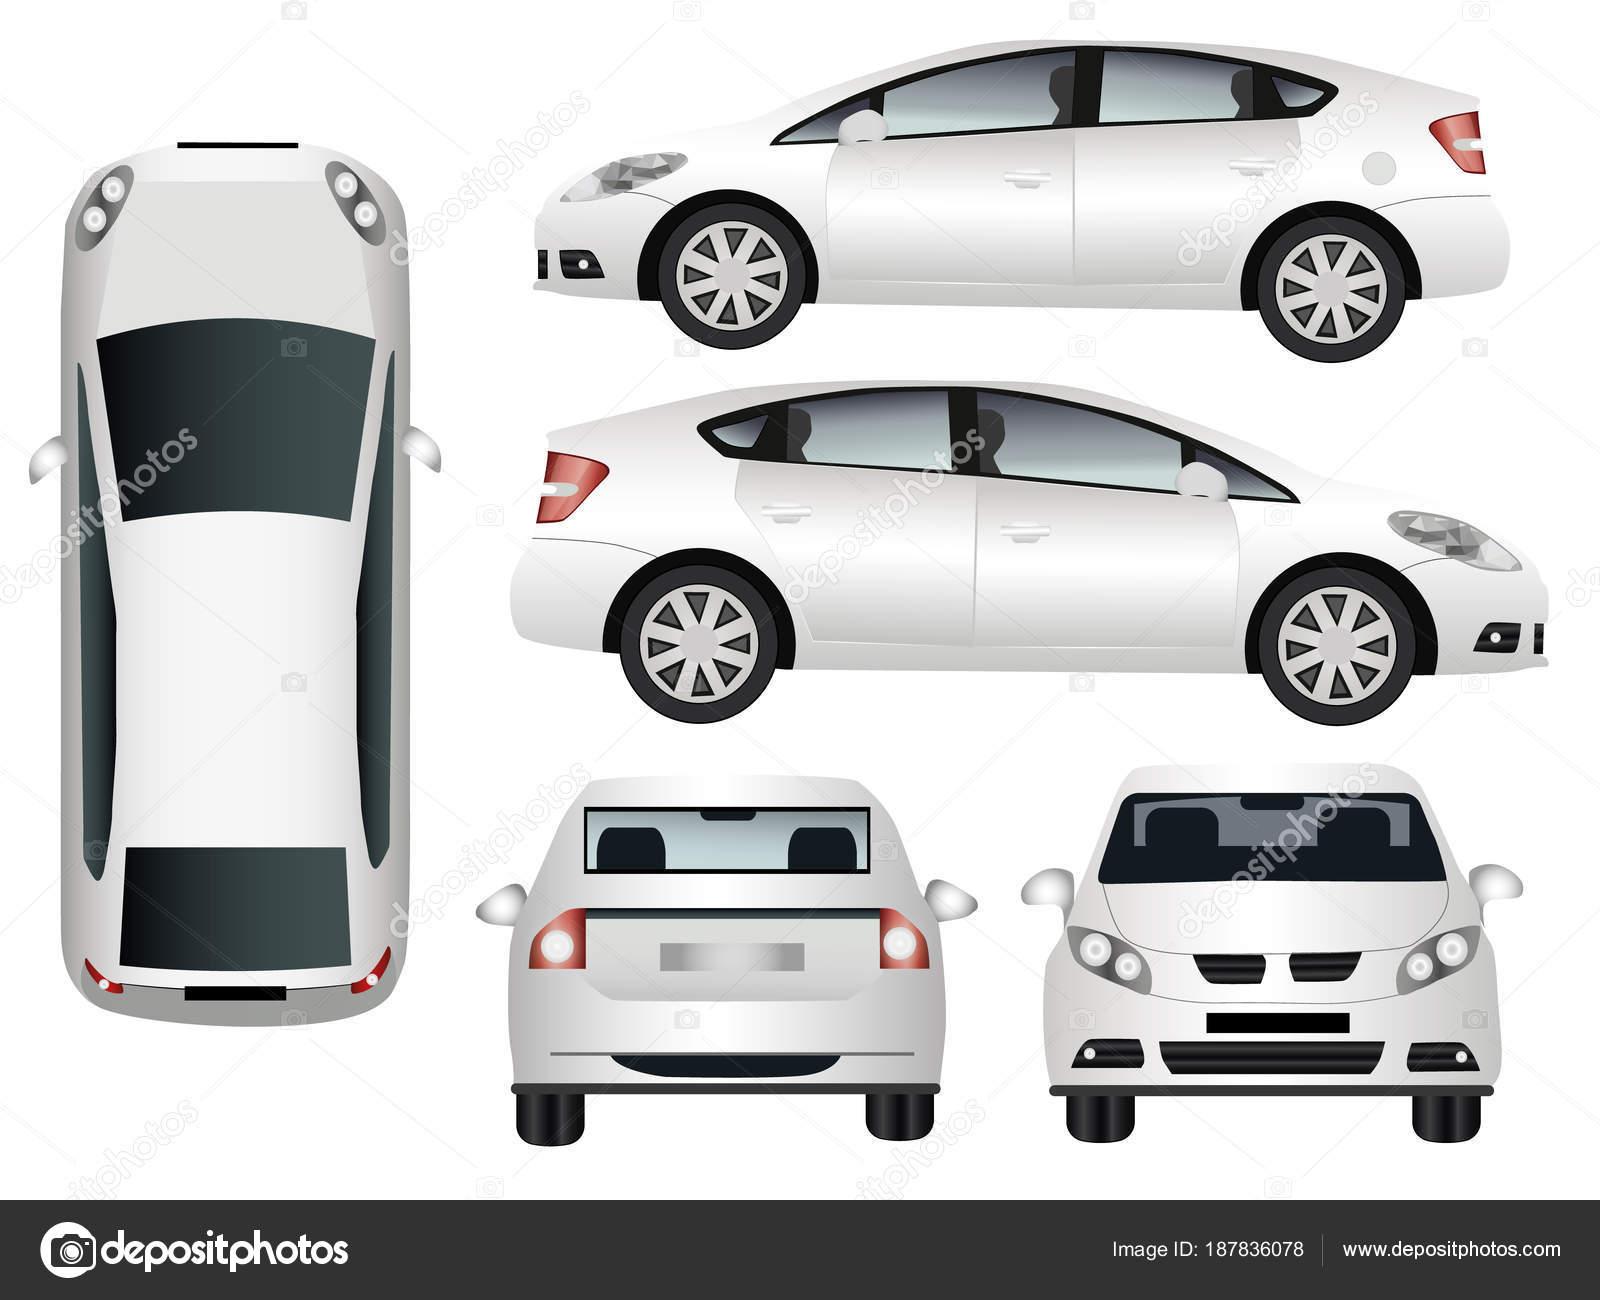 Bmv Motor Vehicles Wallpaperzen Org